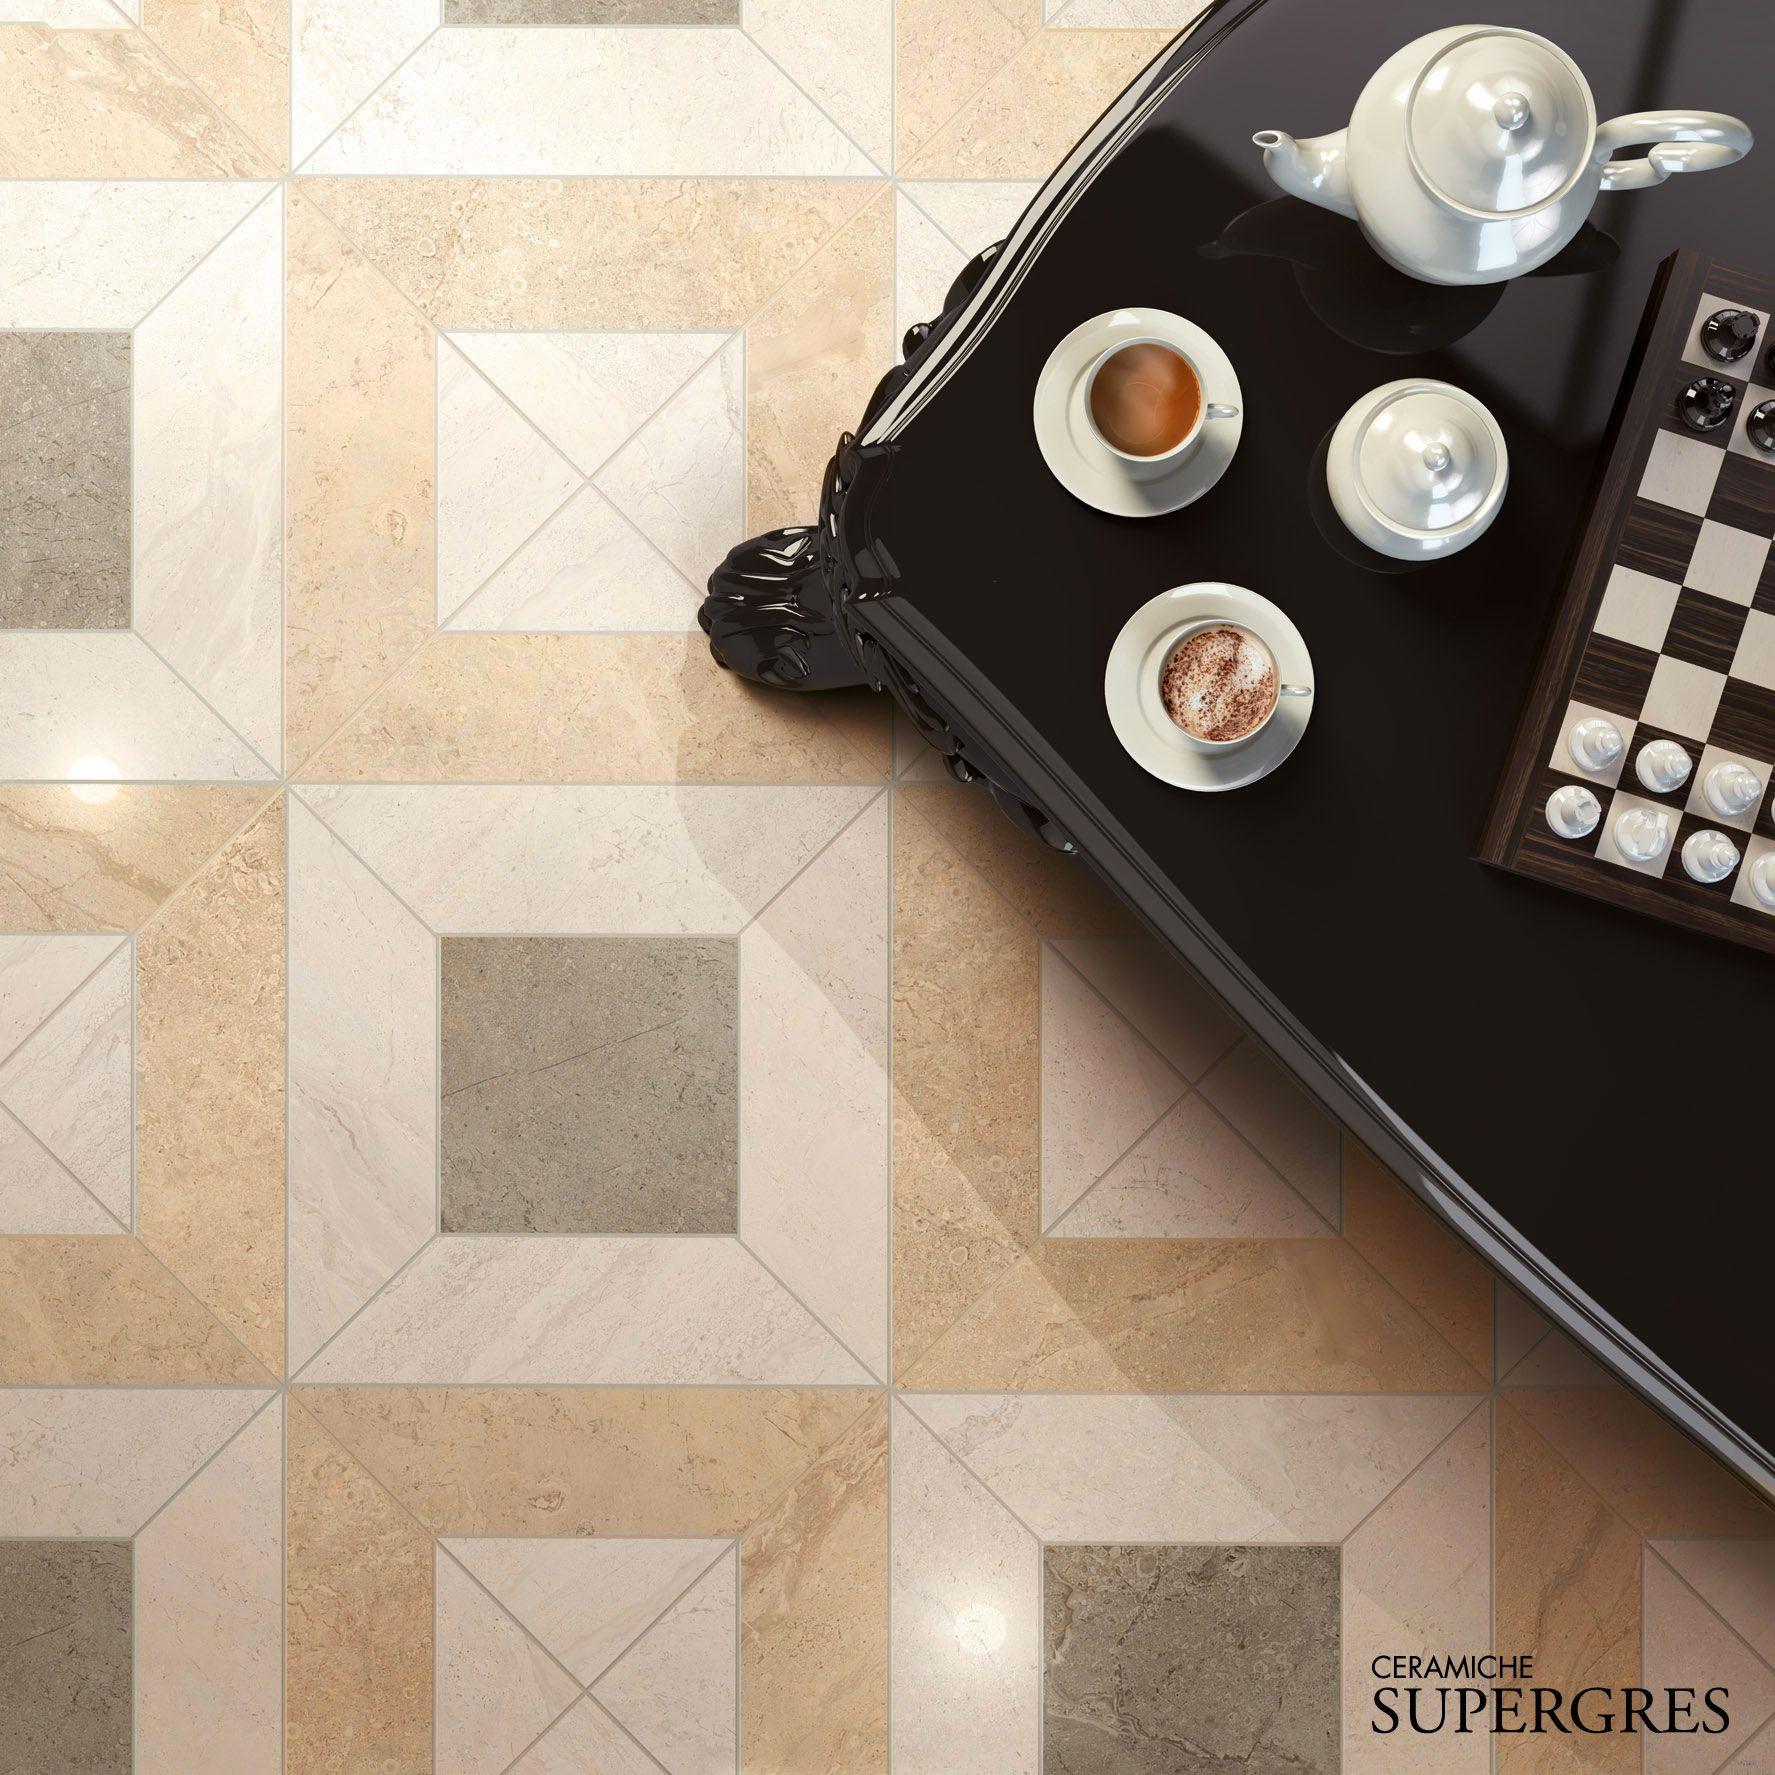 Gotha By Ceramiche Supergres Geometric Porcelain Floor Tile